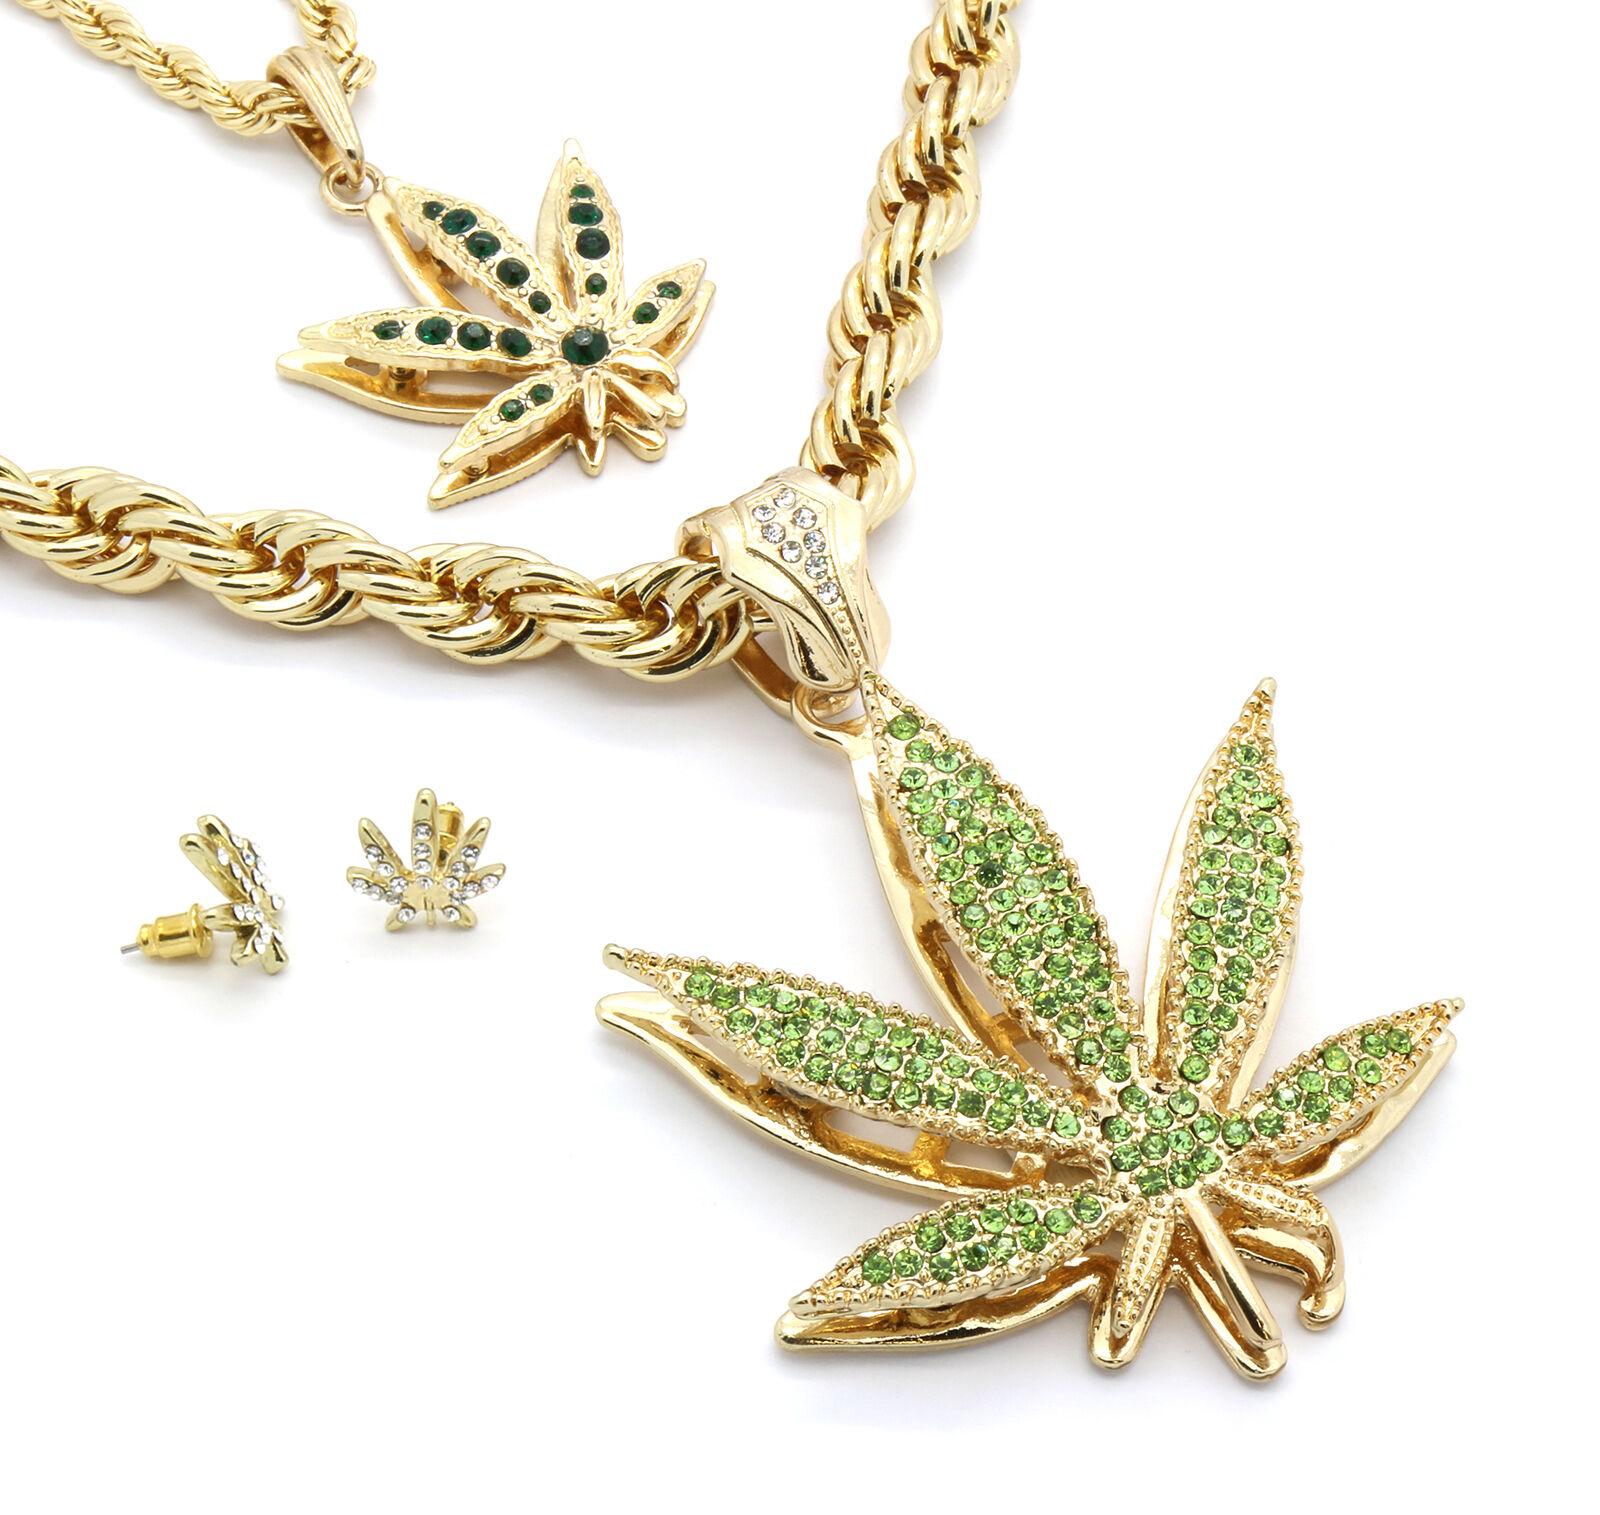 Mens 14k gold Plated Green Marijuana Pendants & Earrings Bundle W  2 Rope Chains